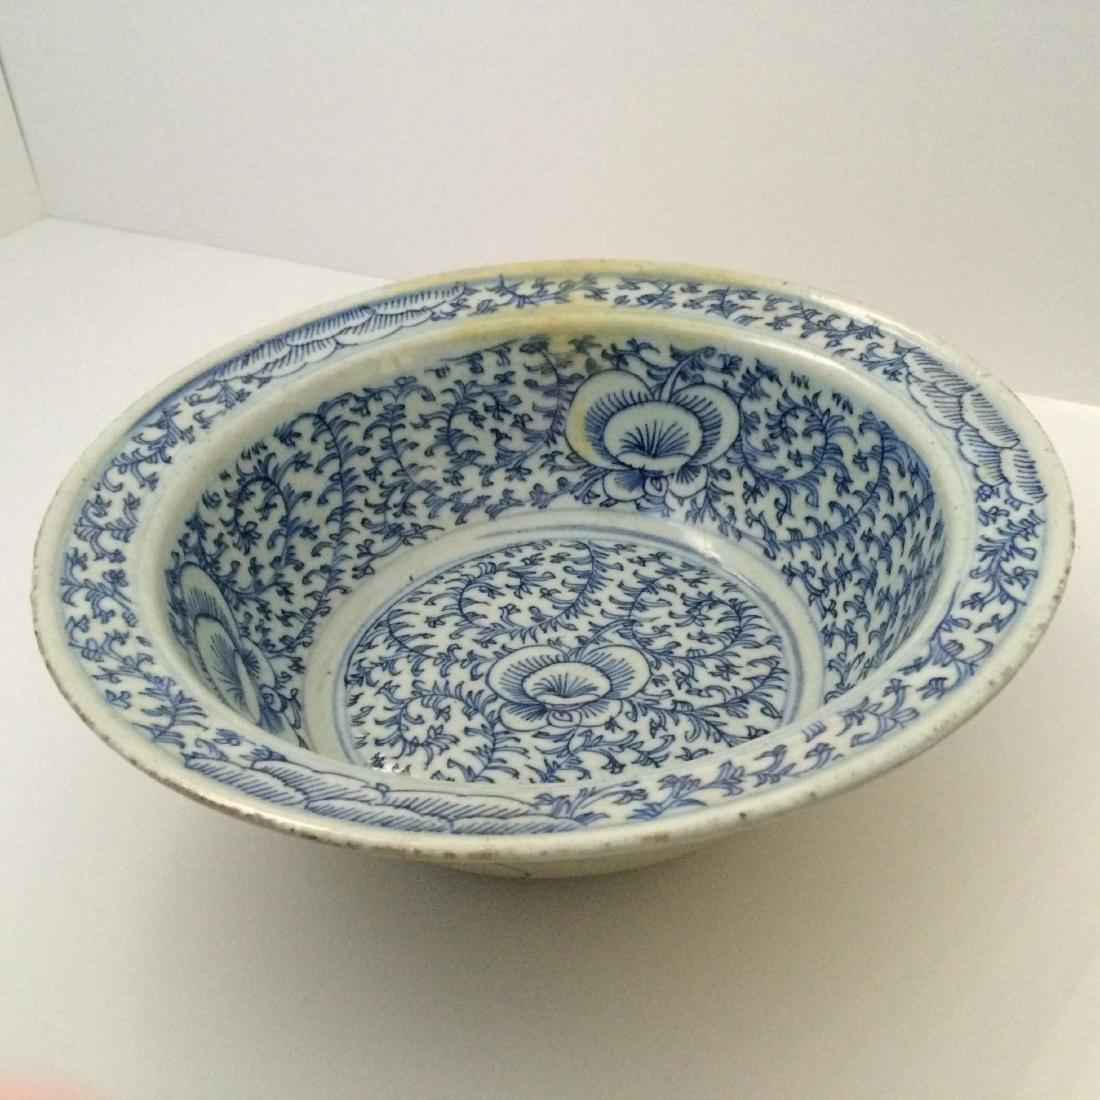 Chinese Chin Dynasty Style Washing White/Blue Bowl